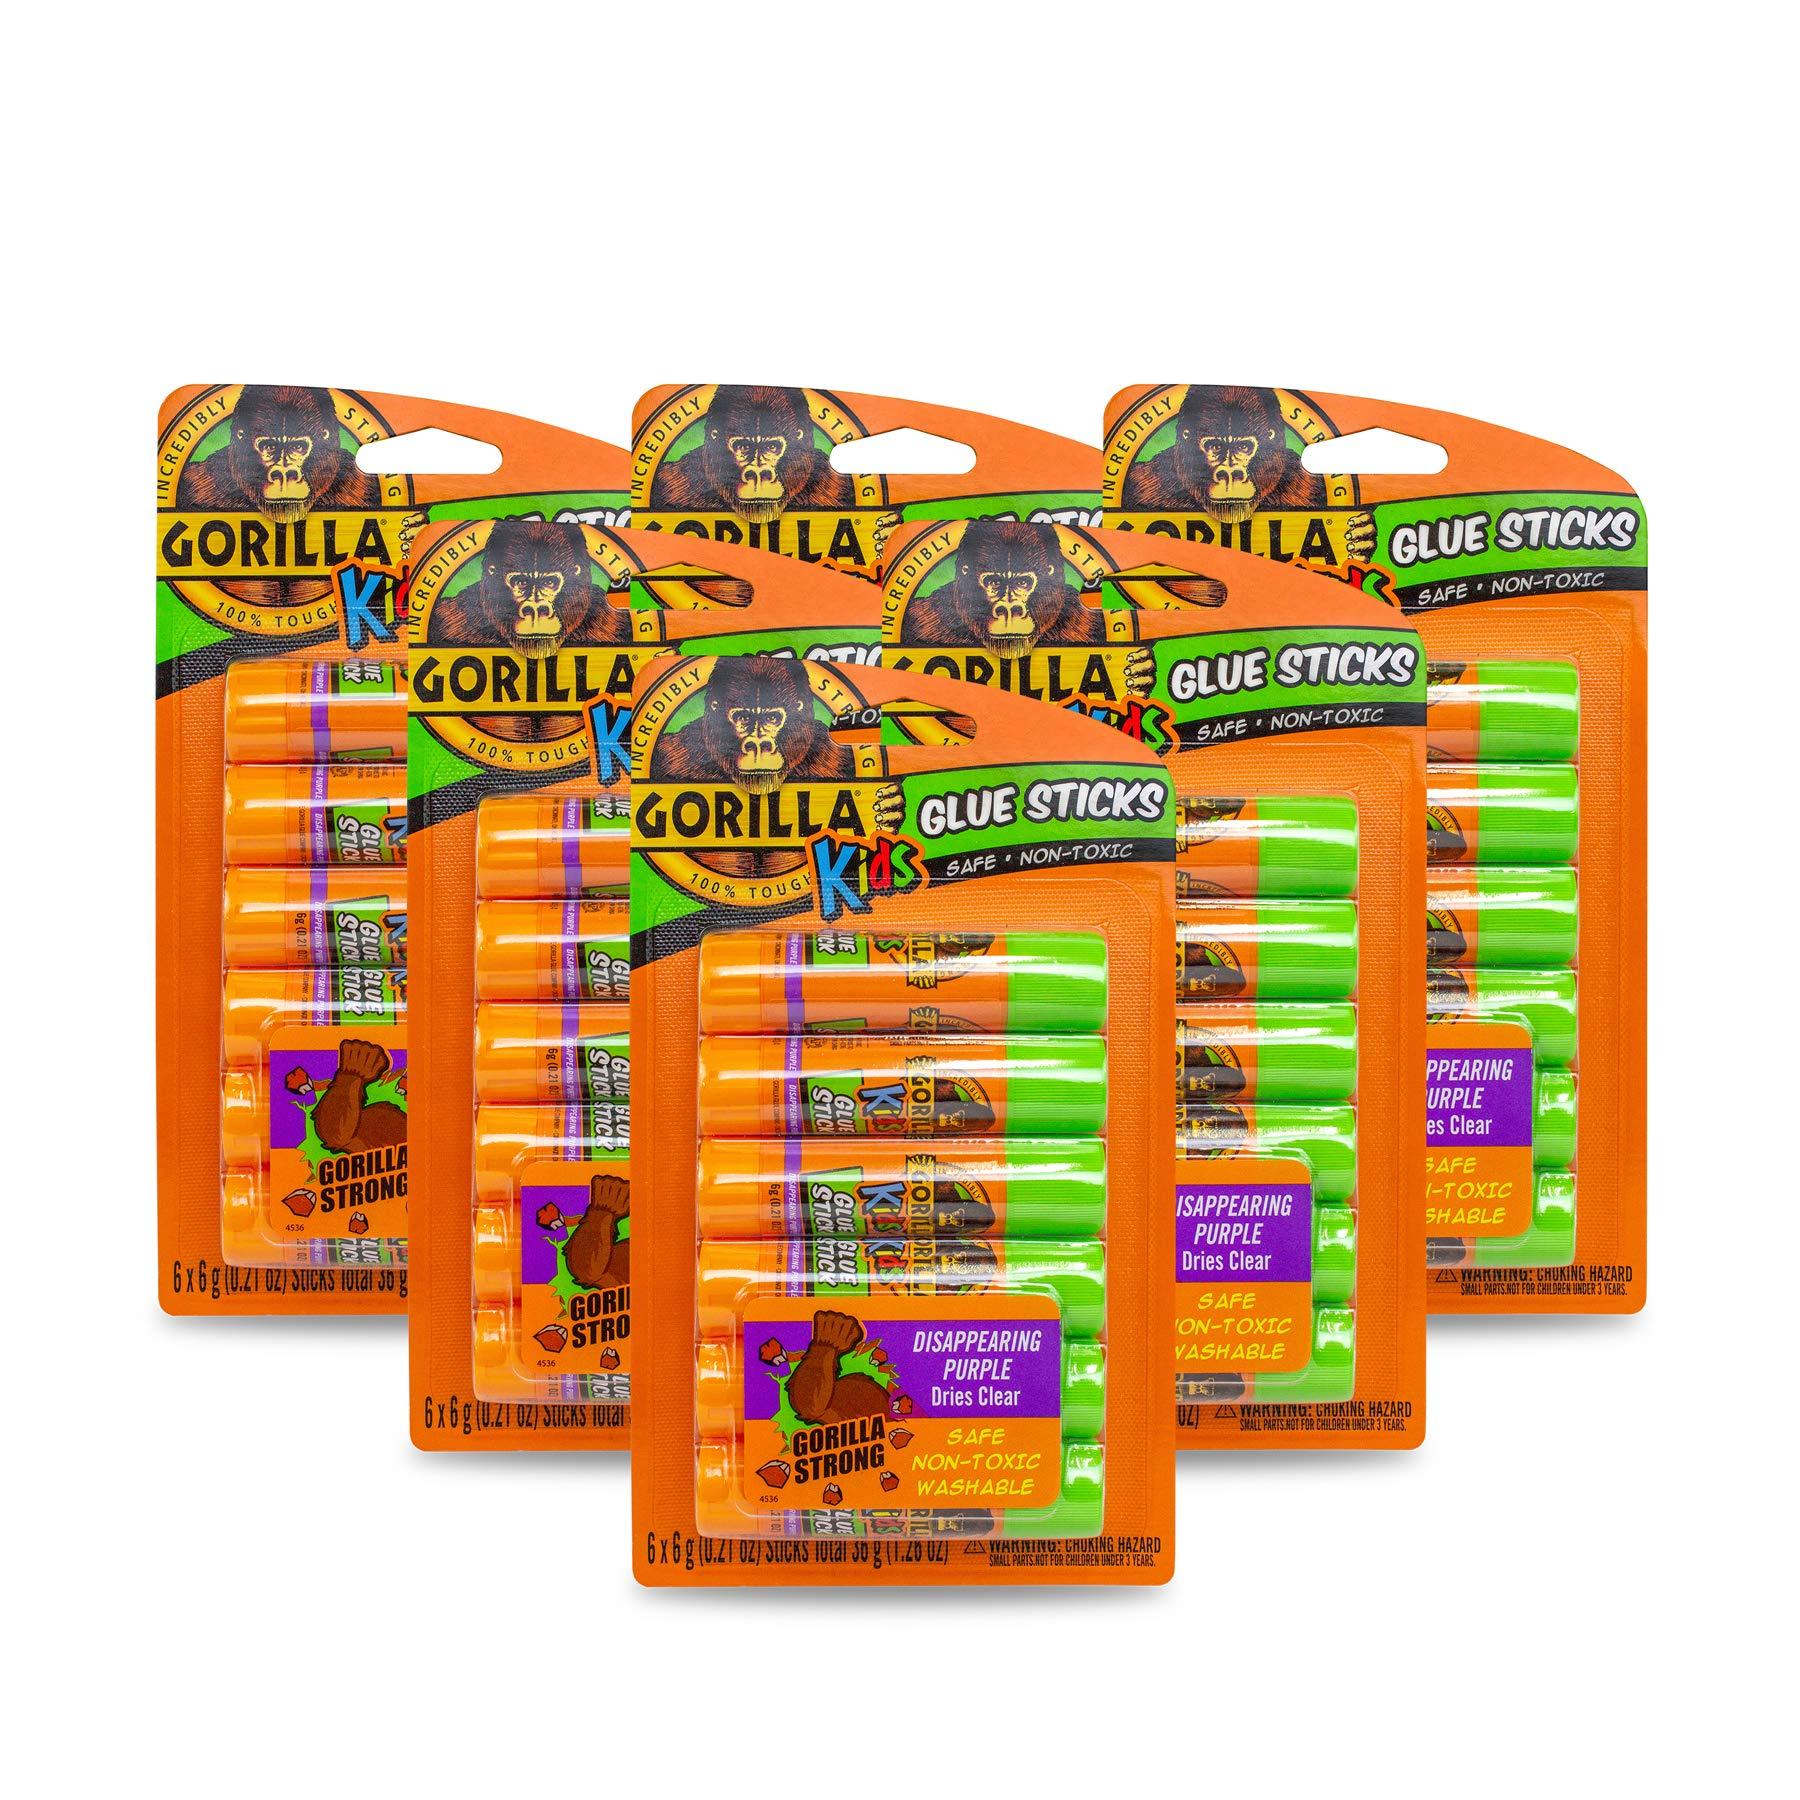 Gorilla Kids Disappearing Purple Glue Sticks, Six 6 gram Sticks, Pack of 6